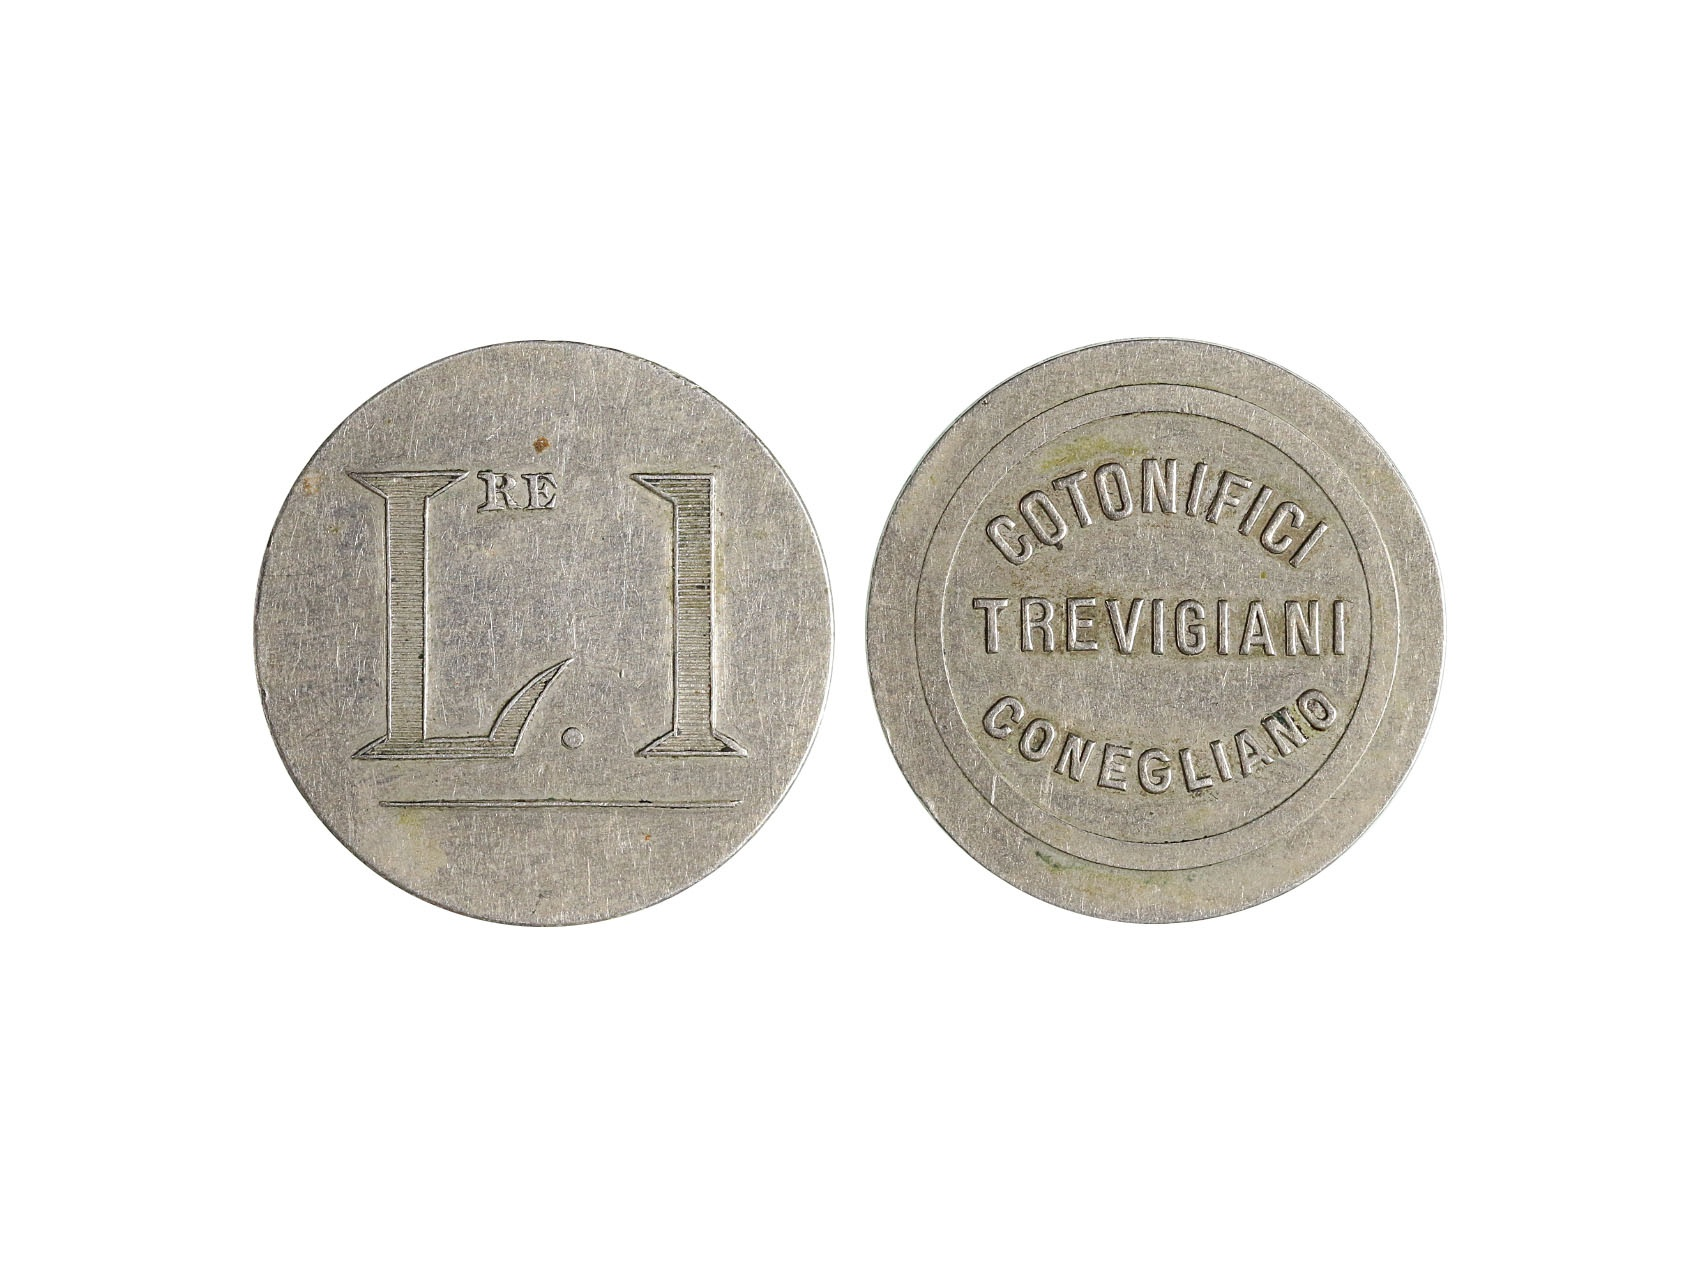 Itálie, nouzové platidlo 1 Lire COTONIFICI TREVIGIANI CONEGLIANO